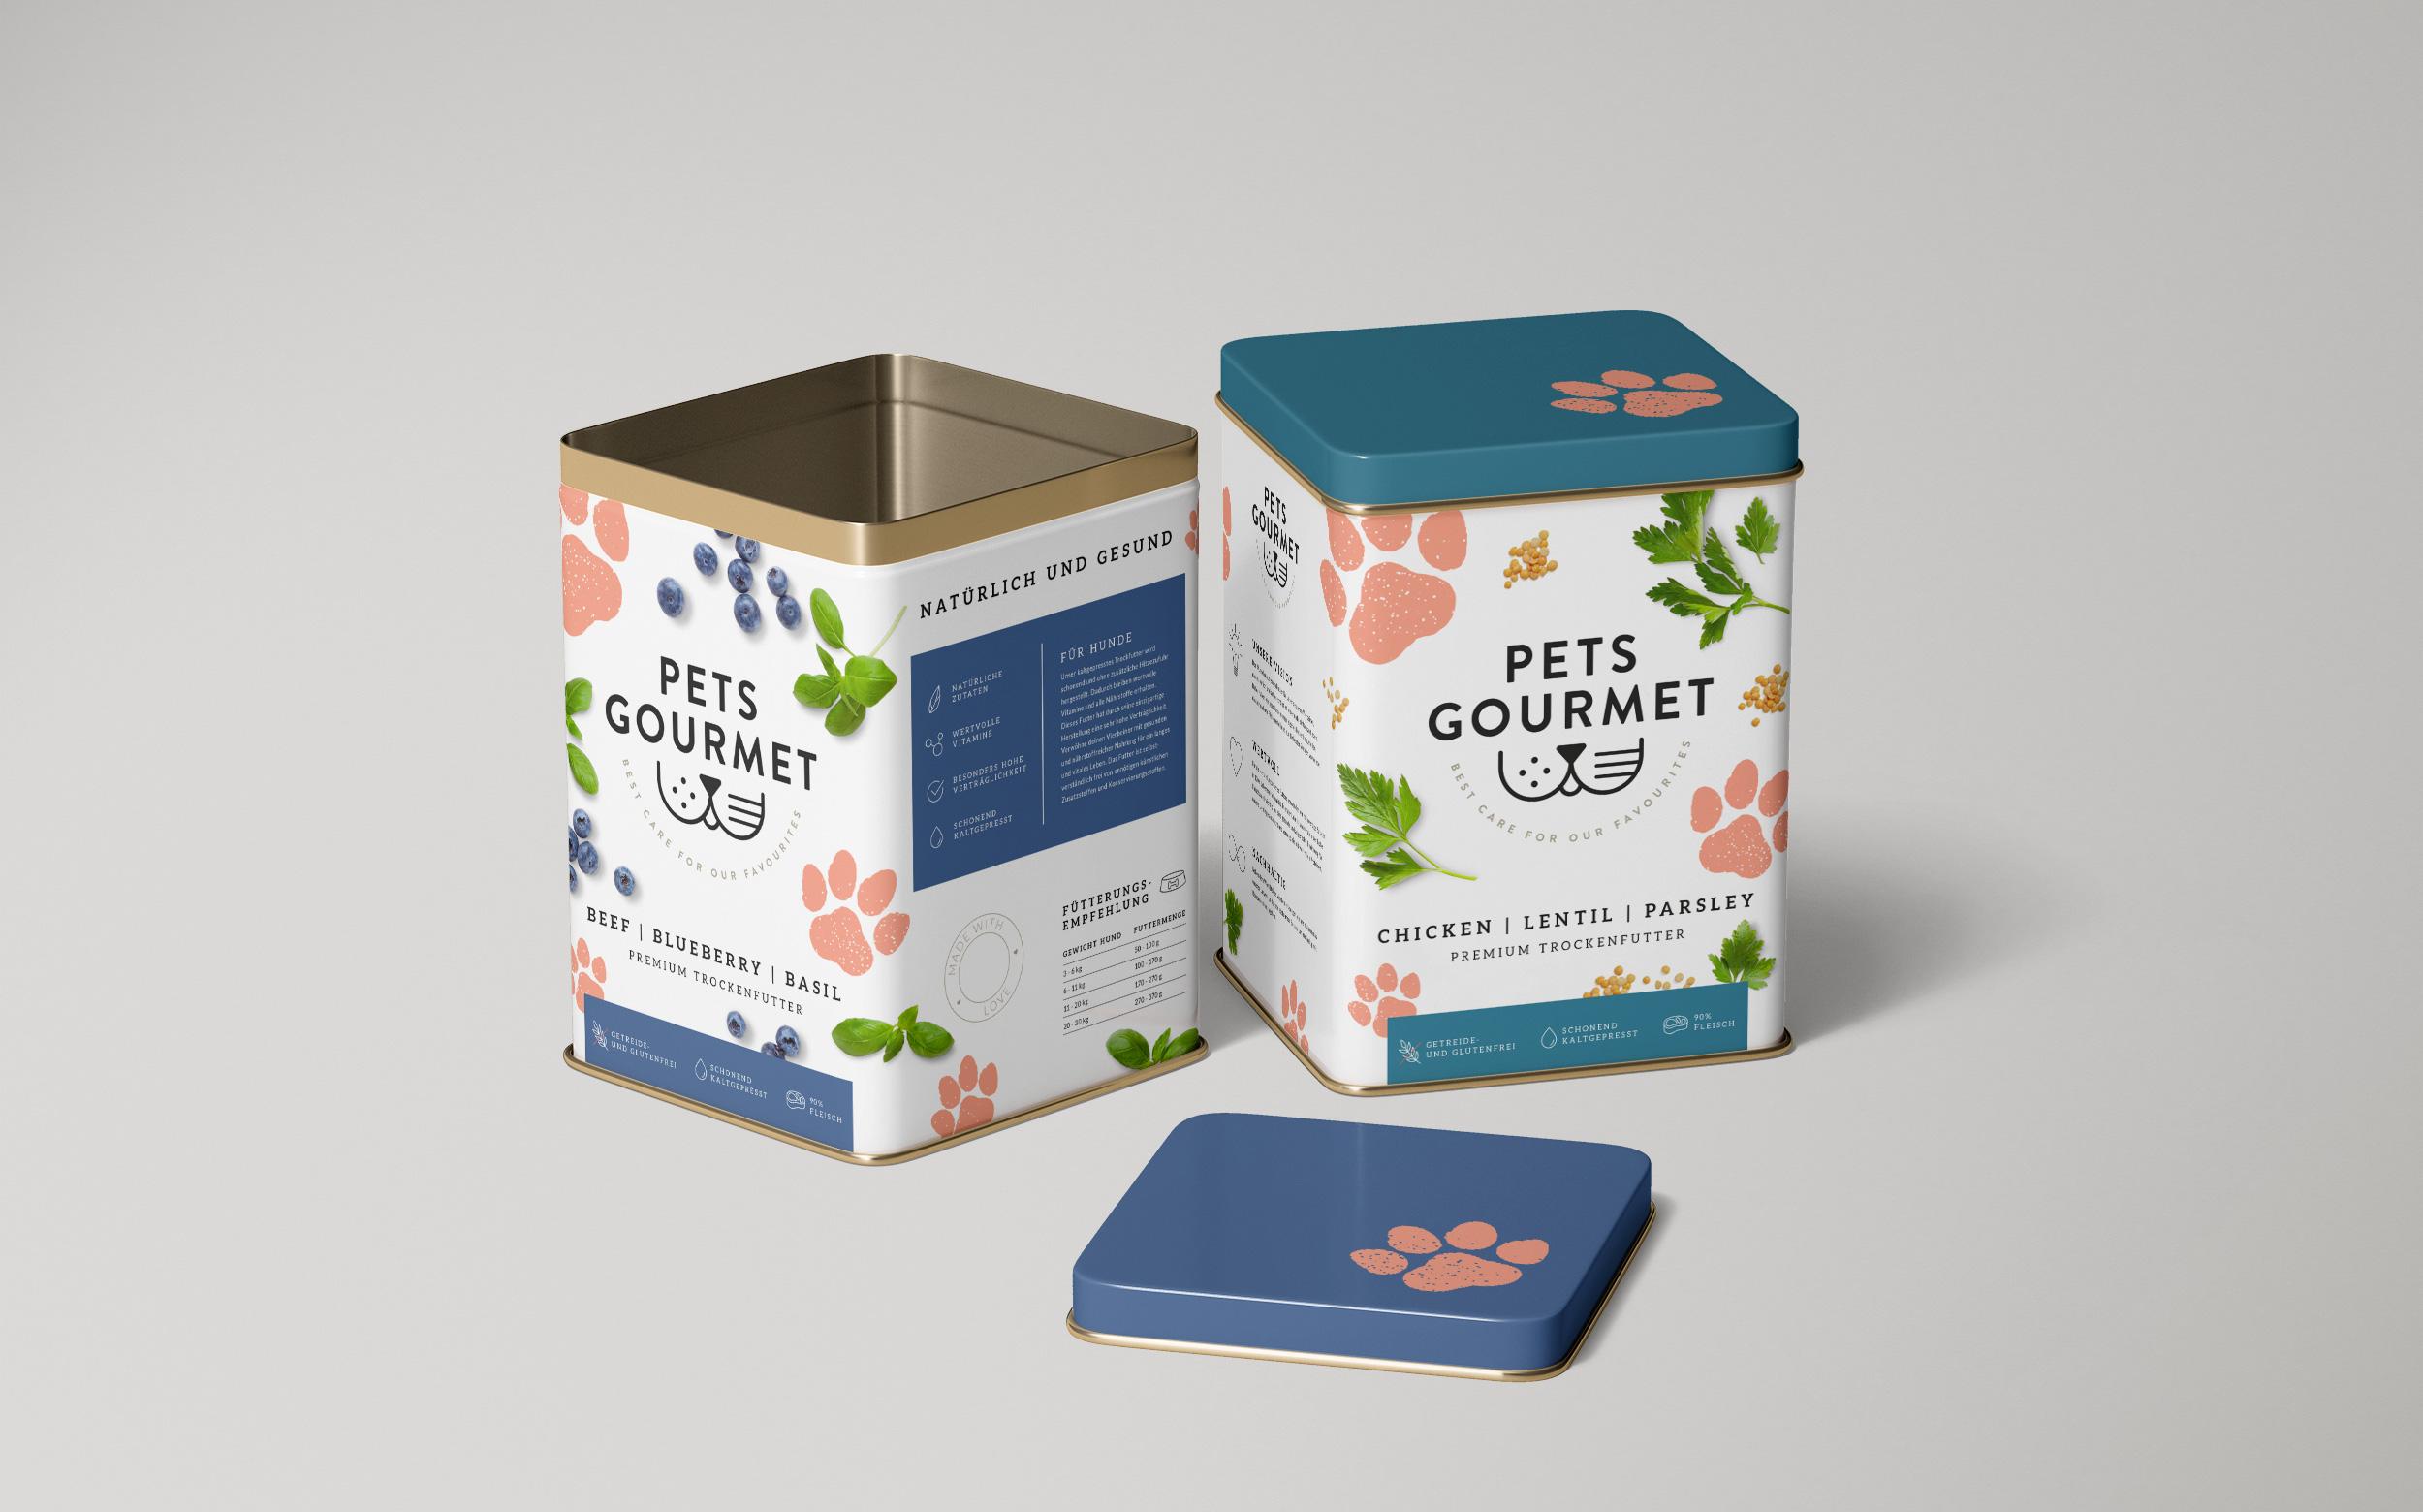 Pets_Gourmet_06